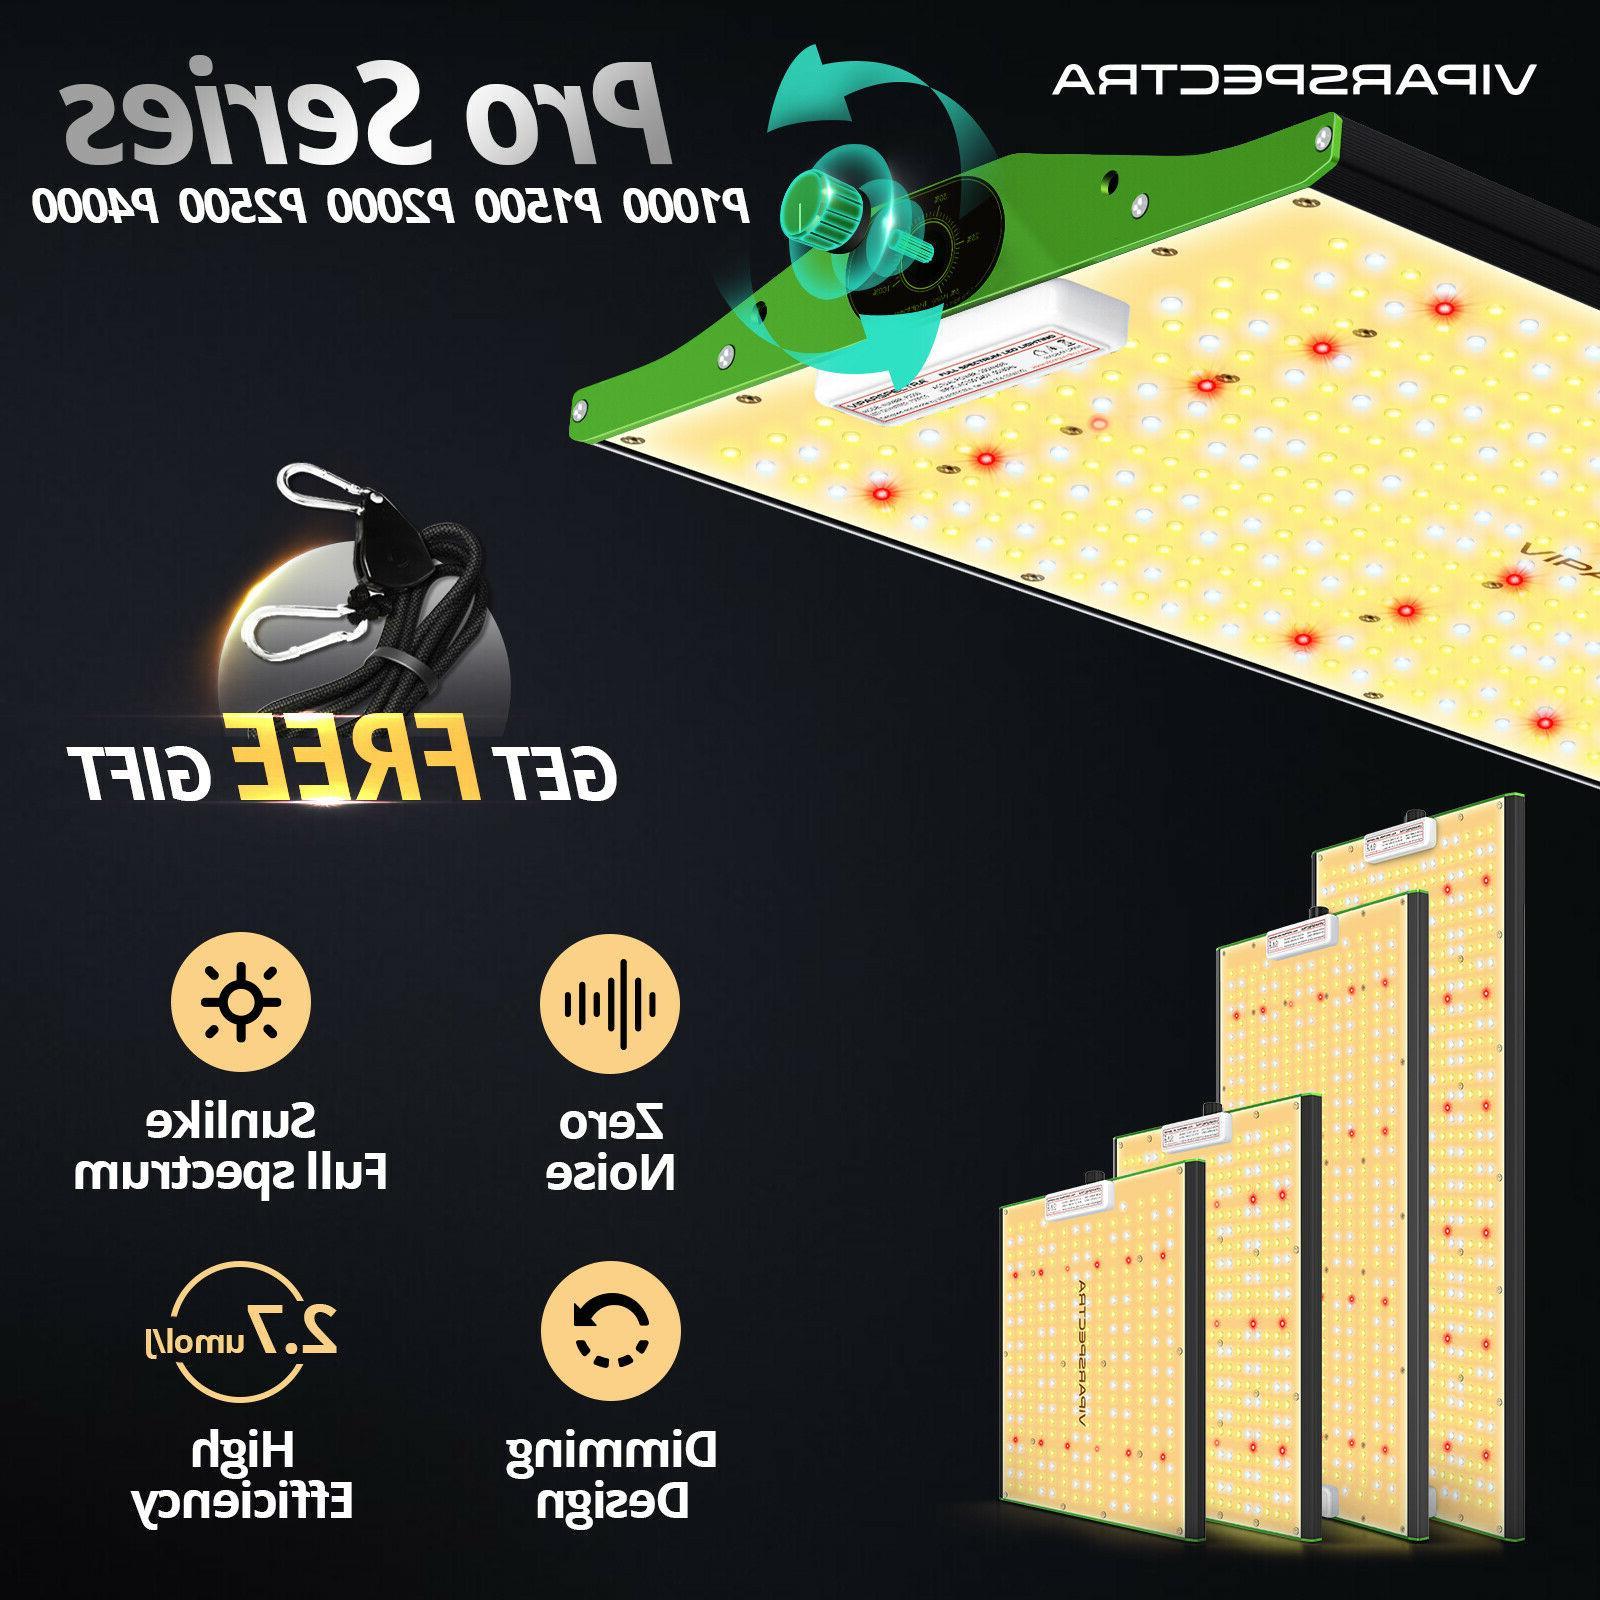 VIPARSPECTRA P1000 P1500 P2000 P2500 LED Grow Light Full Spe